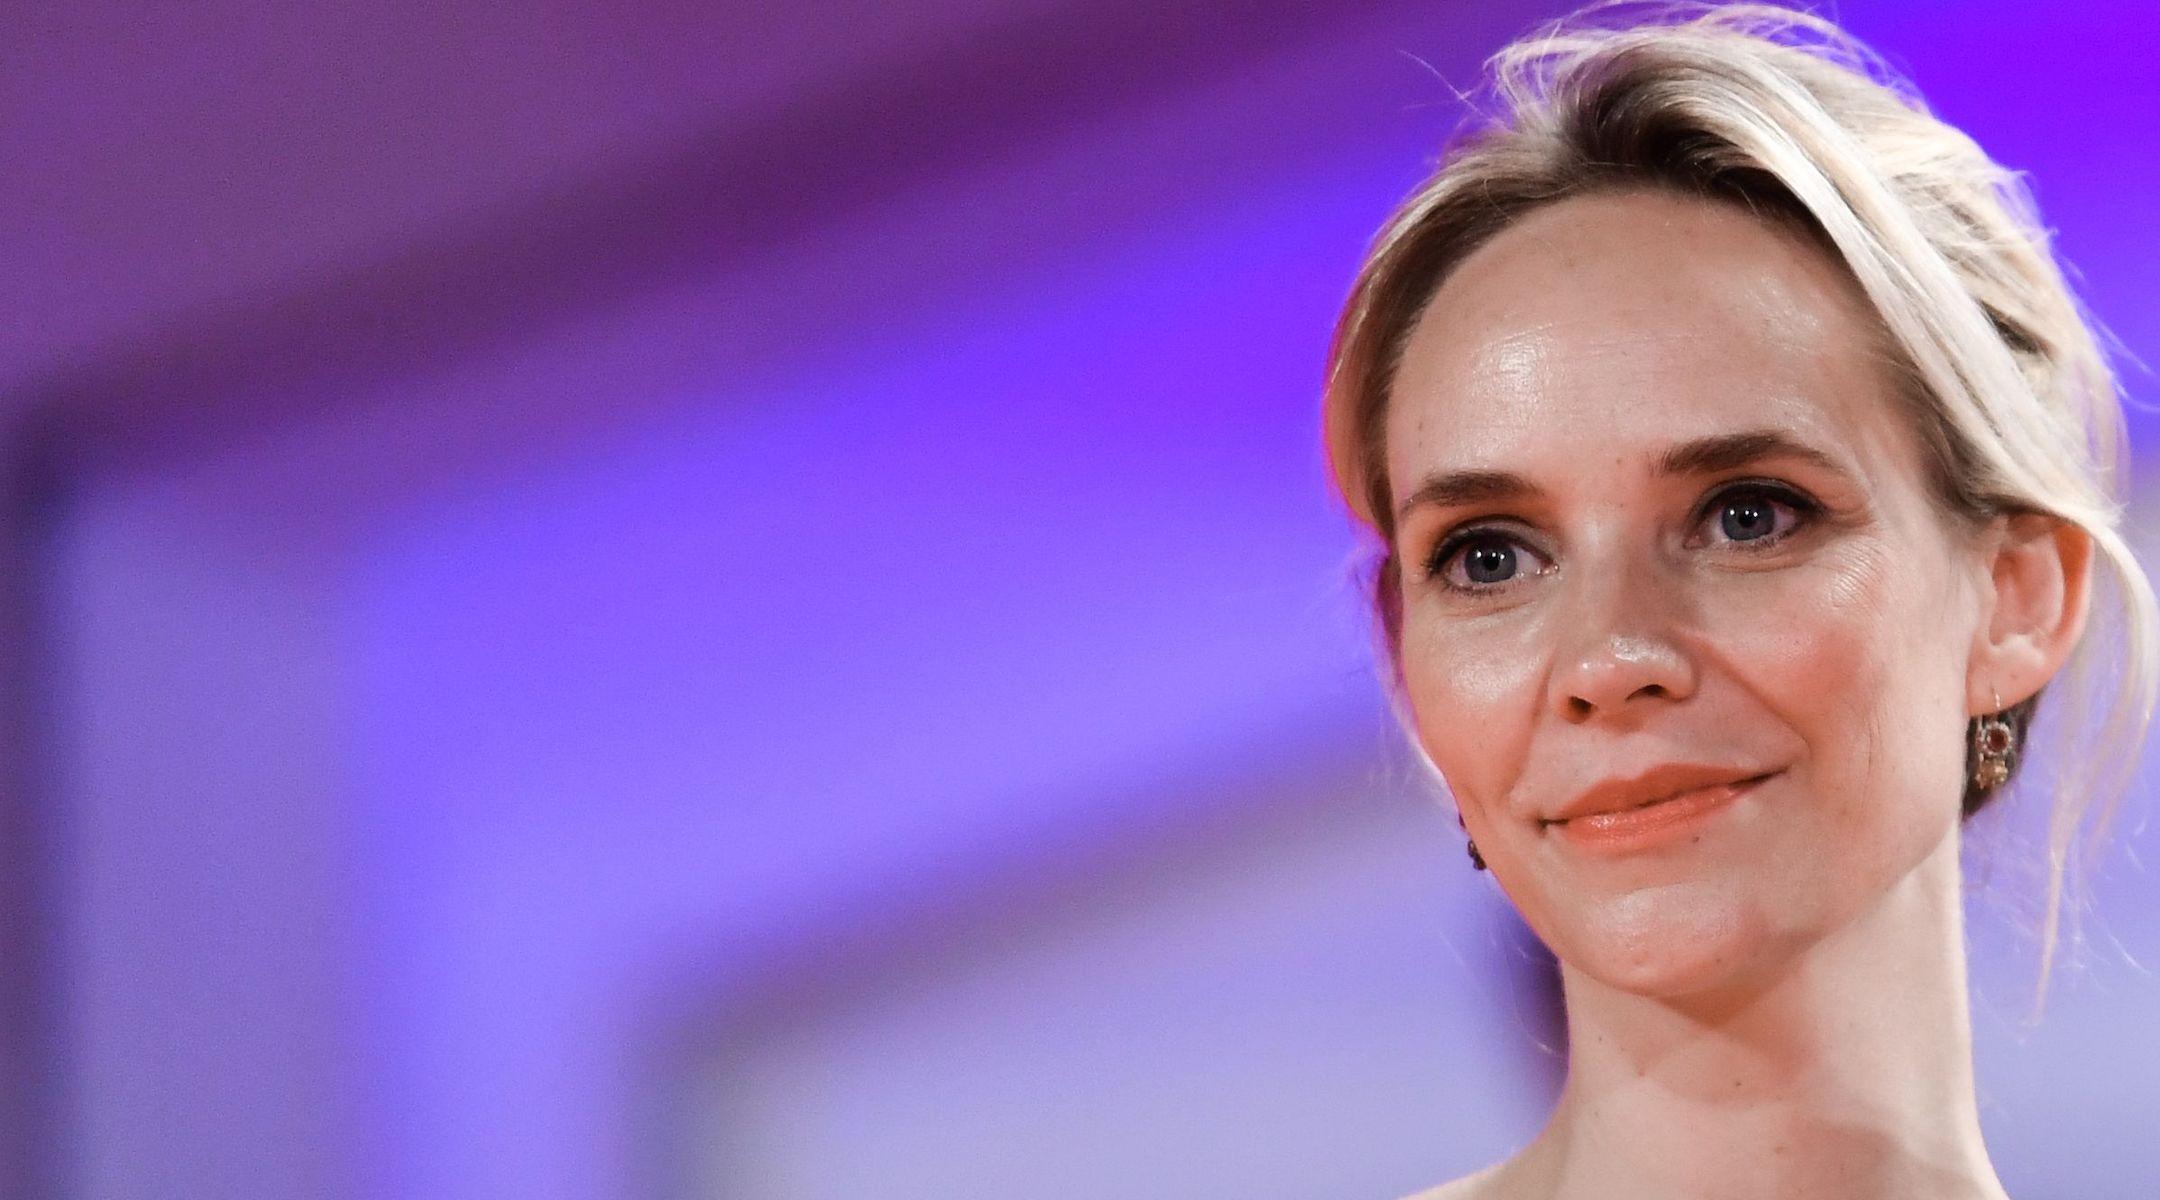 Dutch actress Bracha van Doesburgh